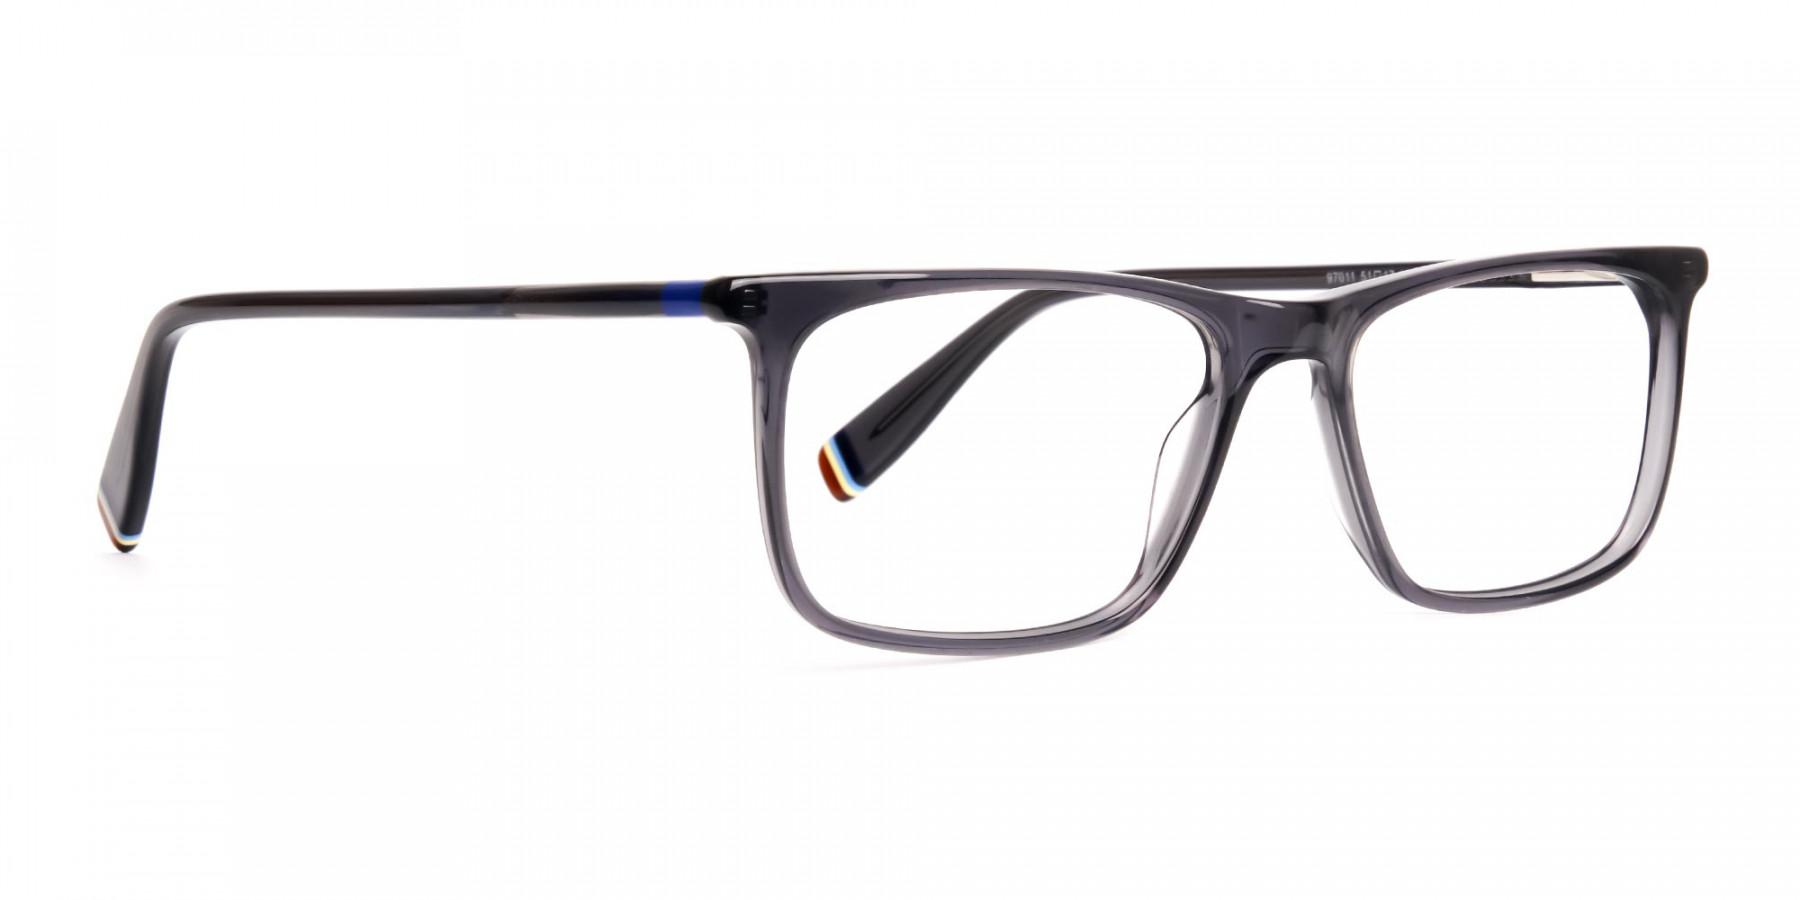 Crystal-Grey-Glasses-Rectangular-Shape-frames-1